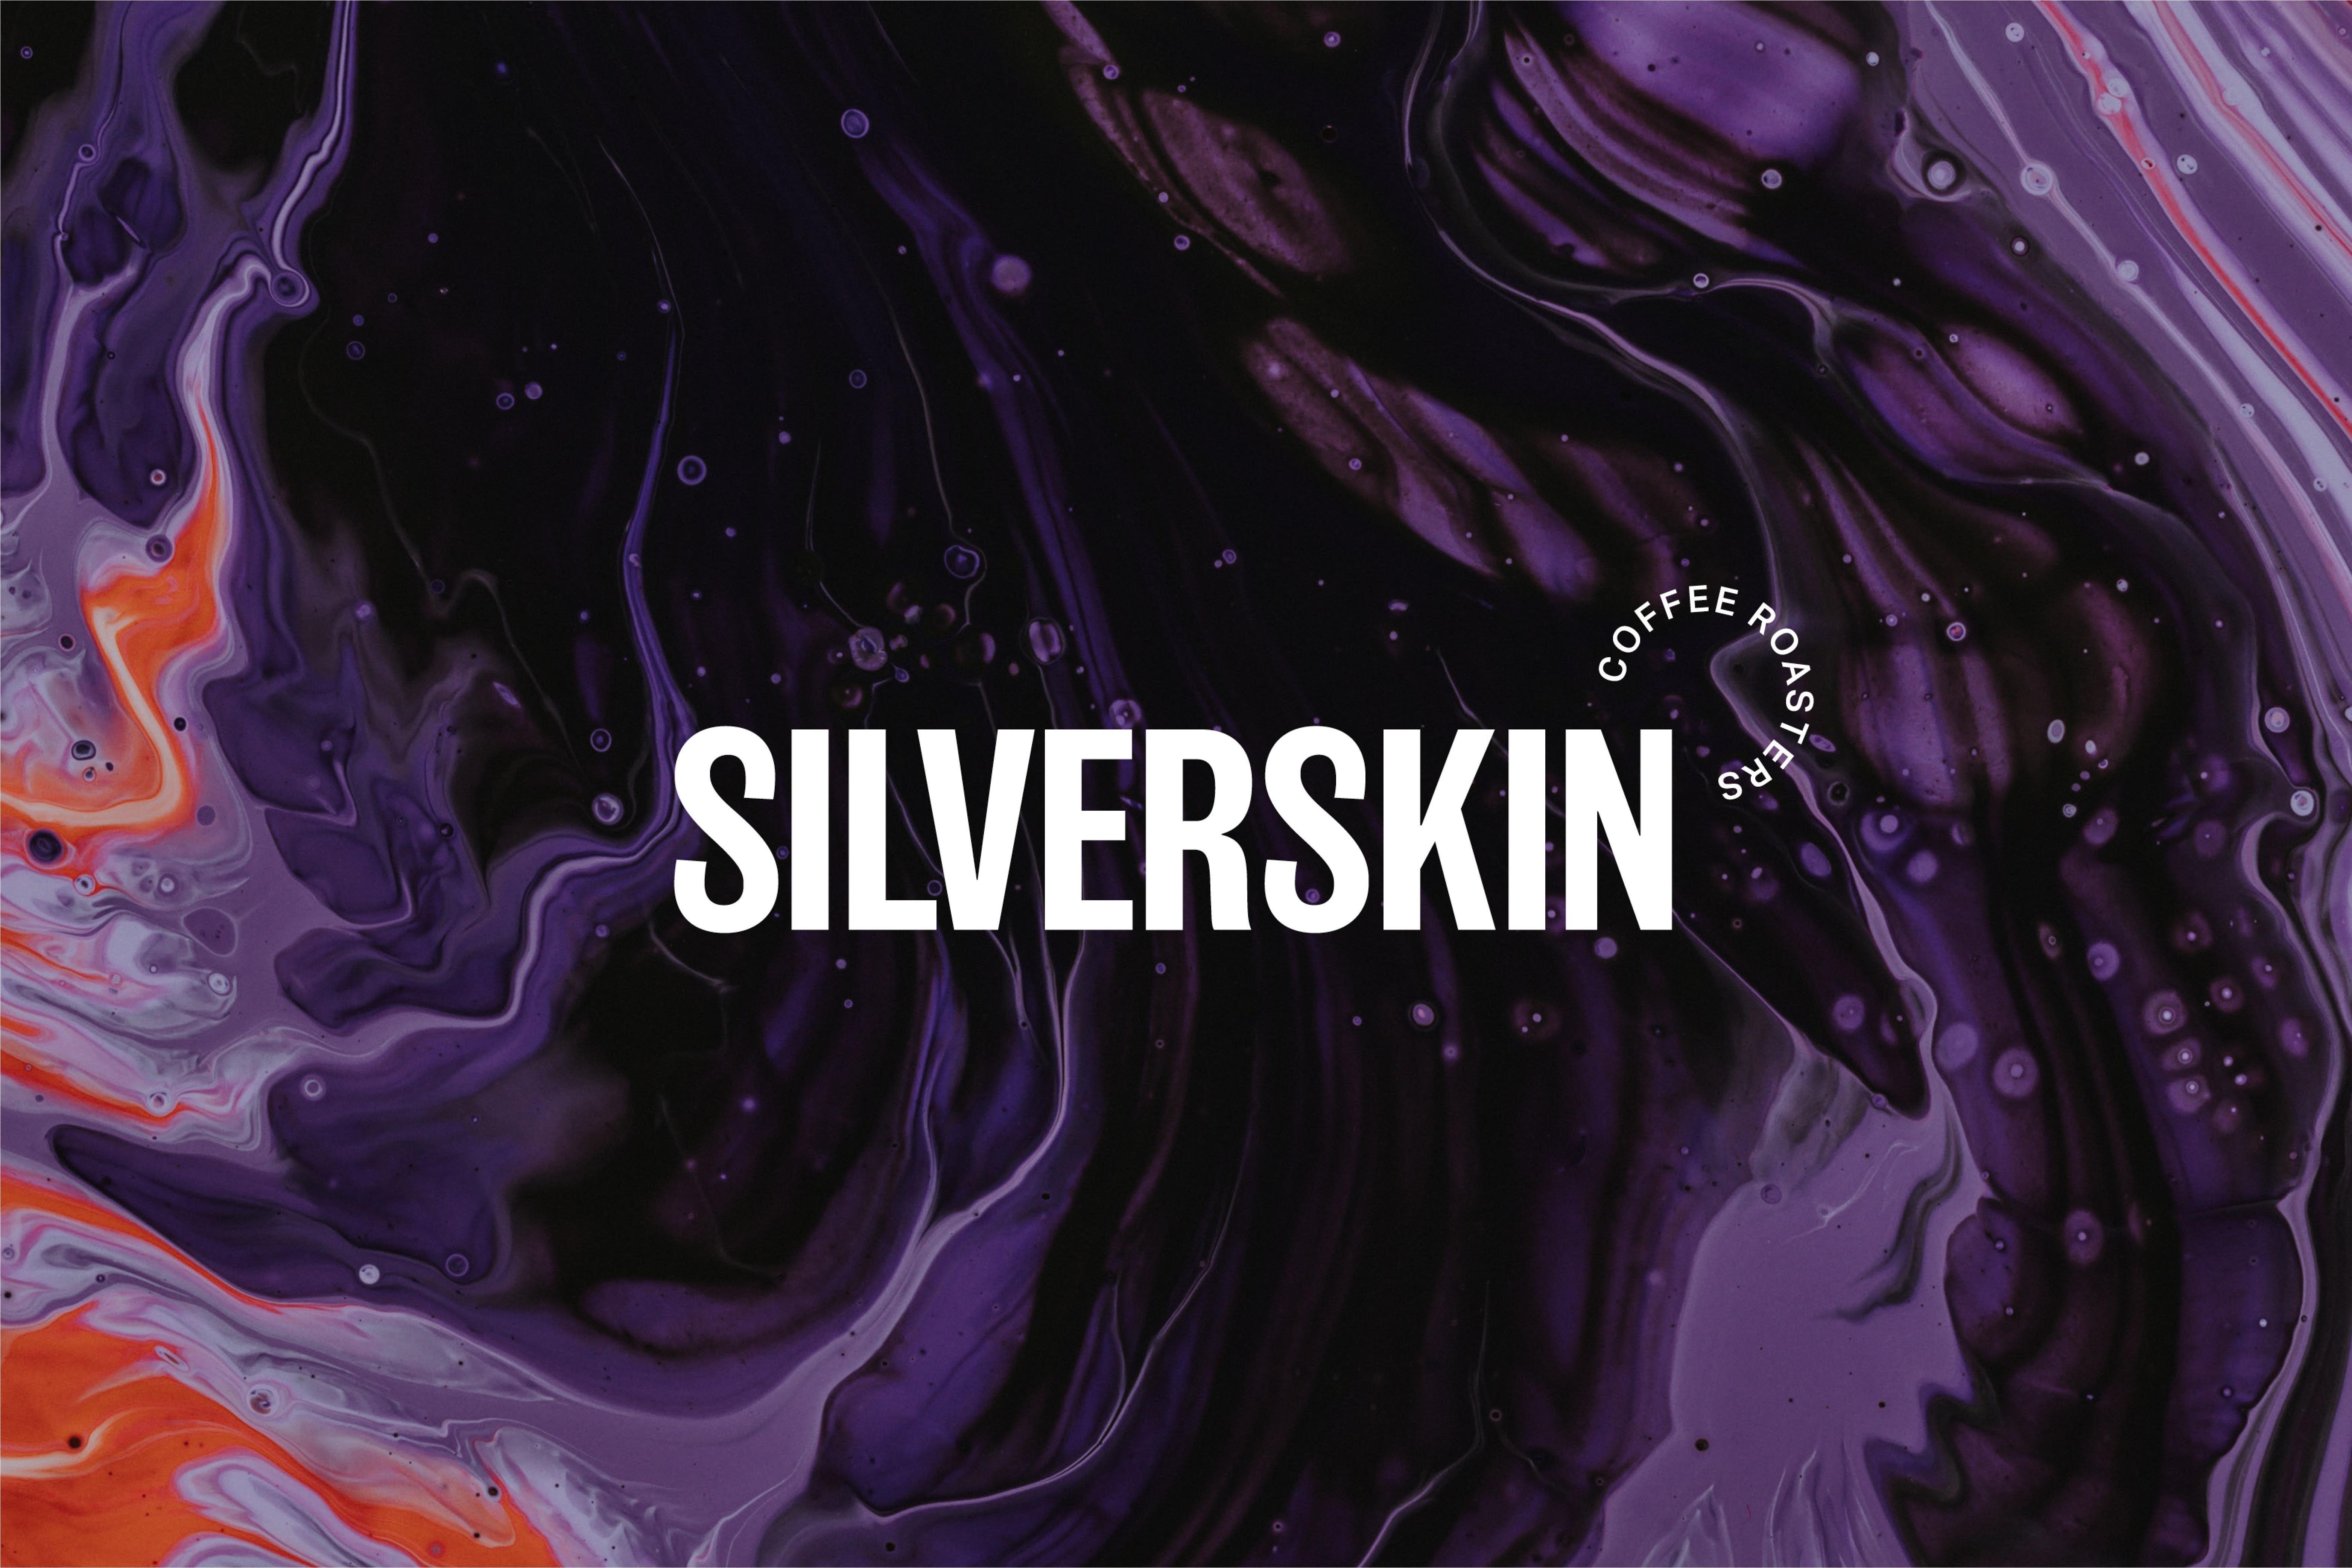 Cover image: Silverskin Coffee Roasters